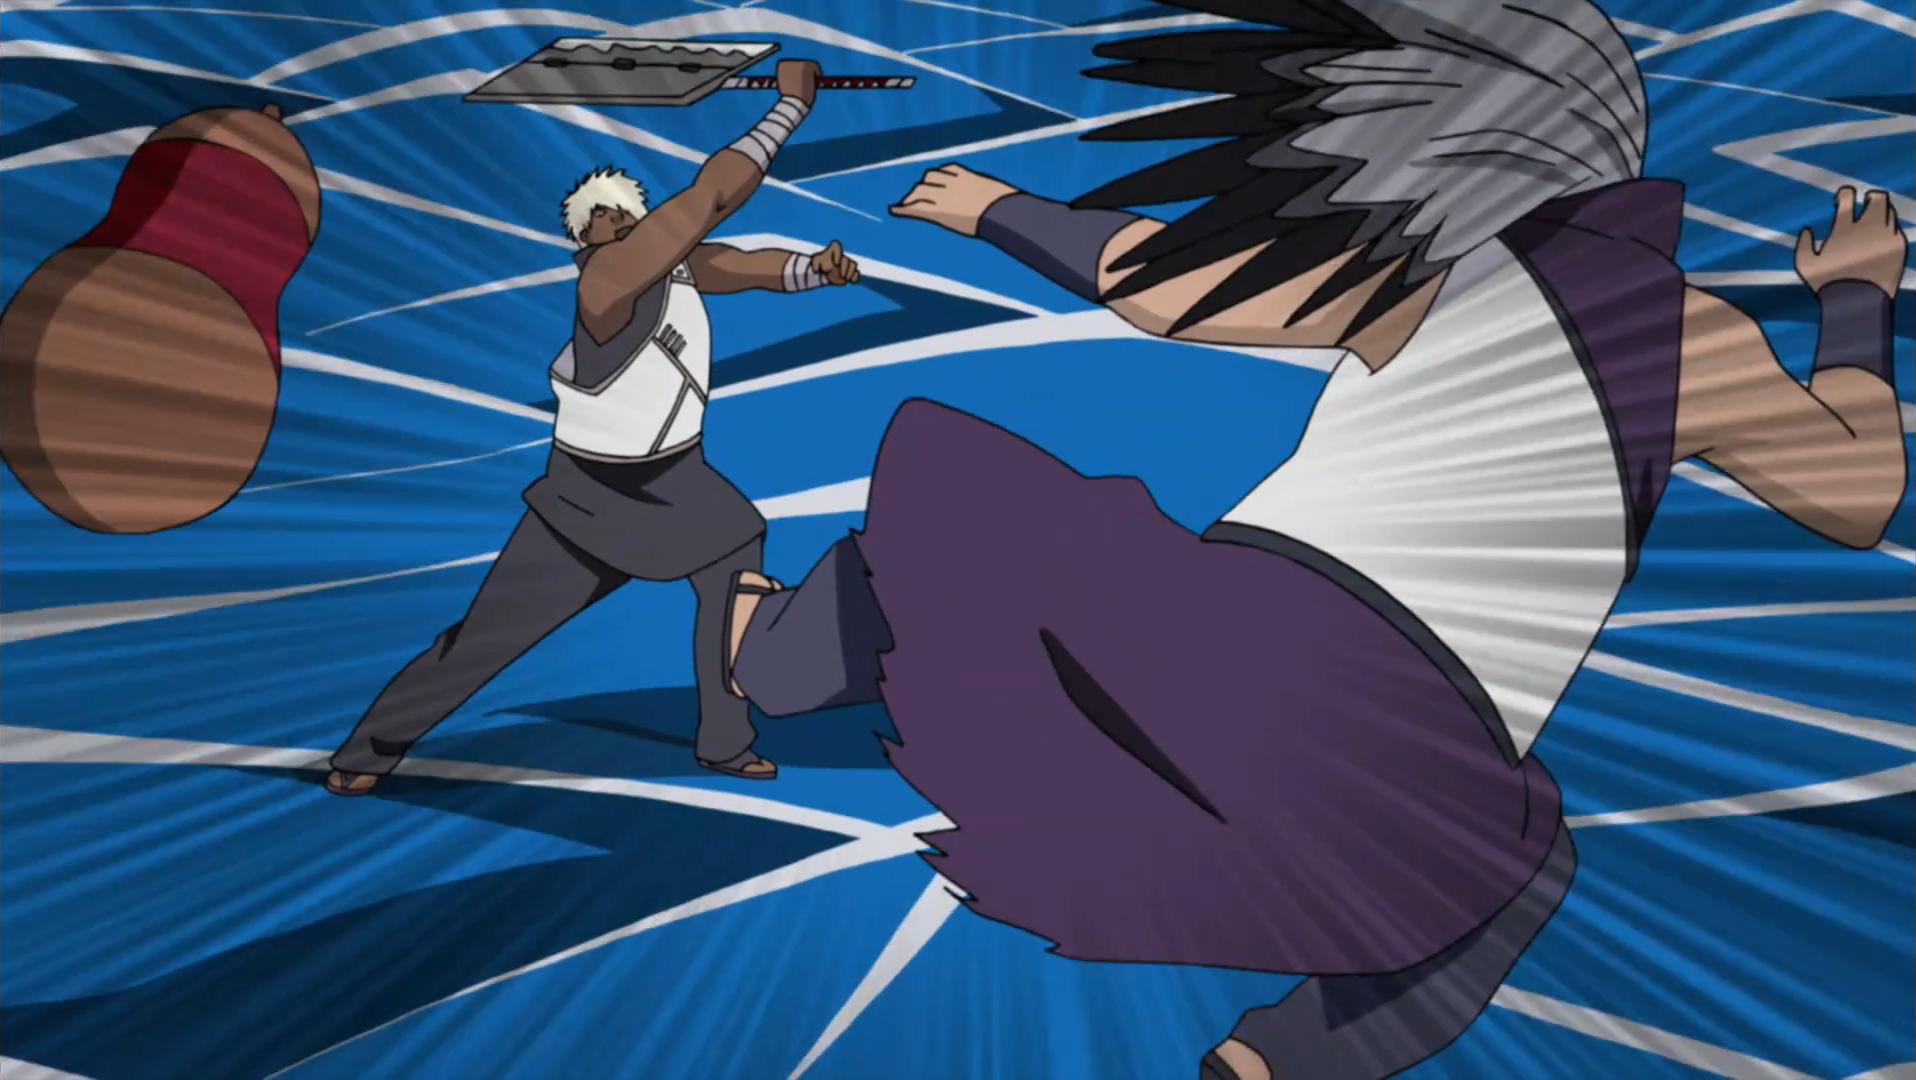 Boruto: Naruto the Movie|Darui (Raikage) by iEnniDESIGN on DeviantArt